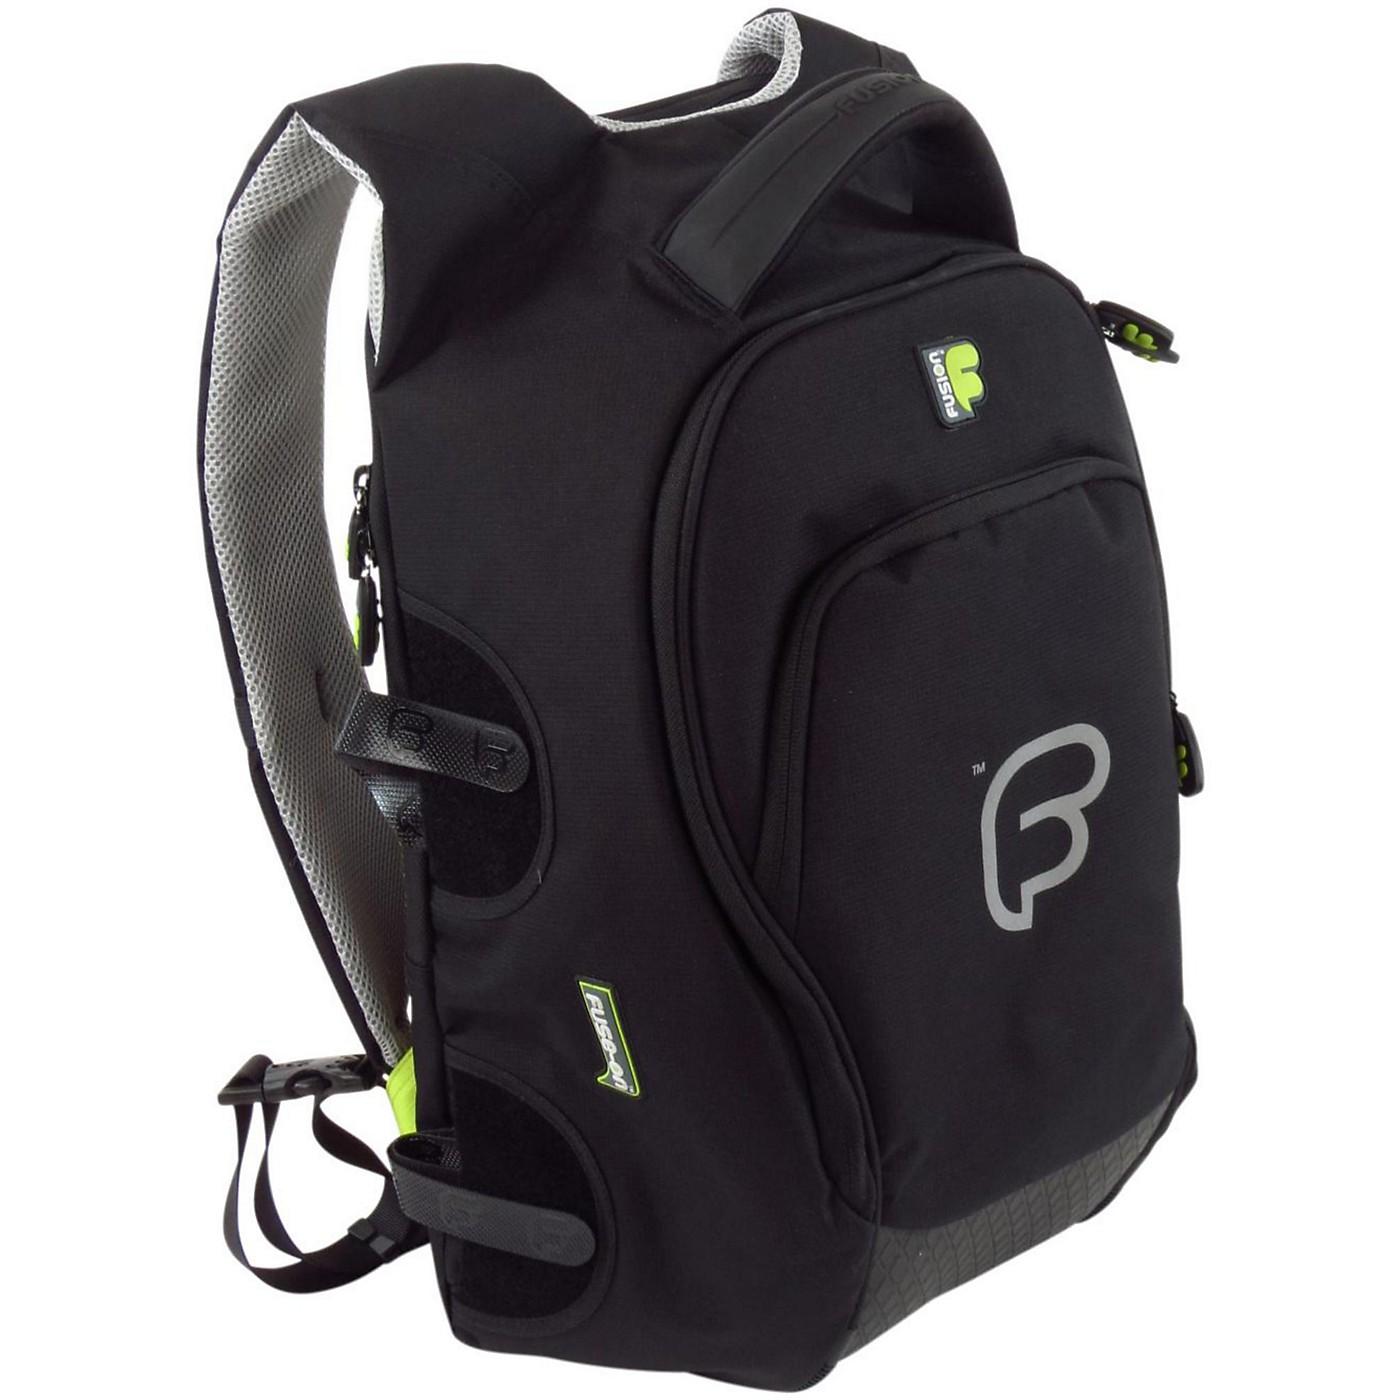 Fusion Urban Large Backpack FUSE-ON Bag thumbnail